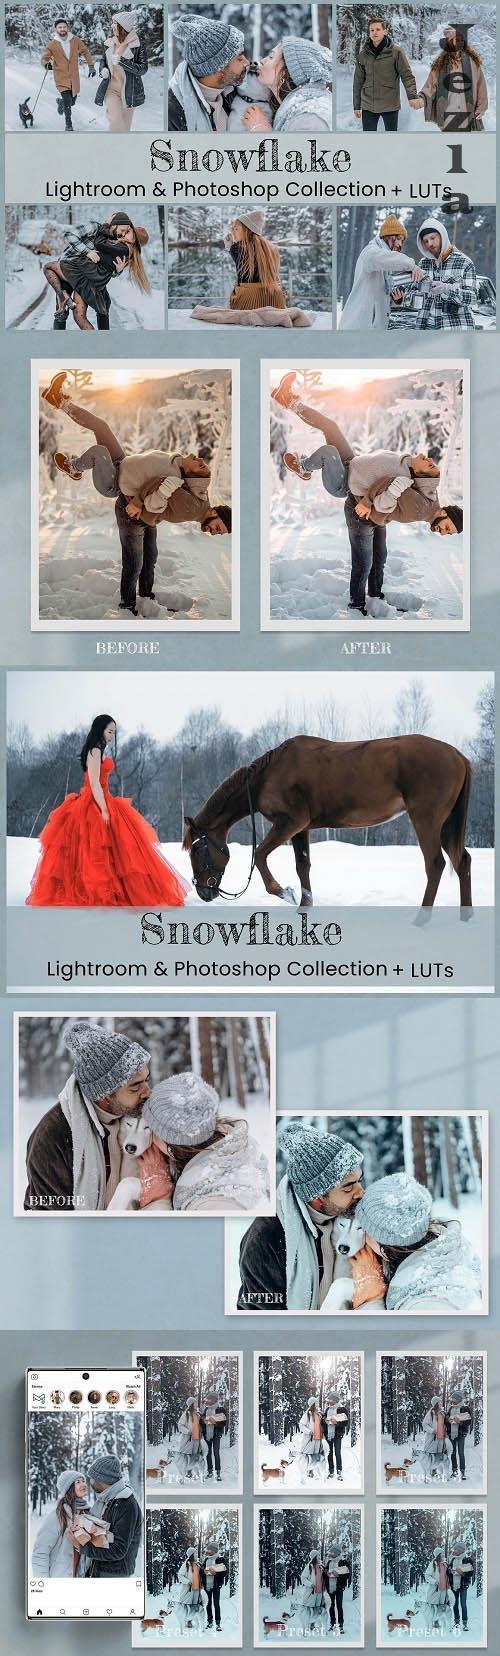 Snowflake Lightroom Photoshop LUTs - 6573896